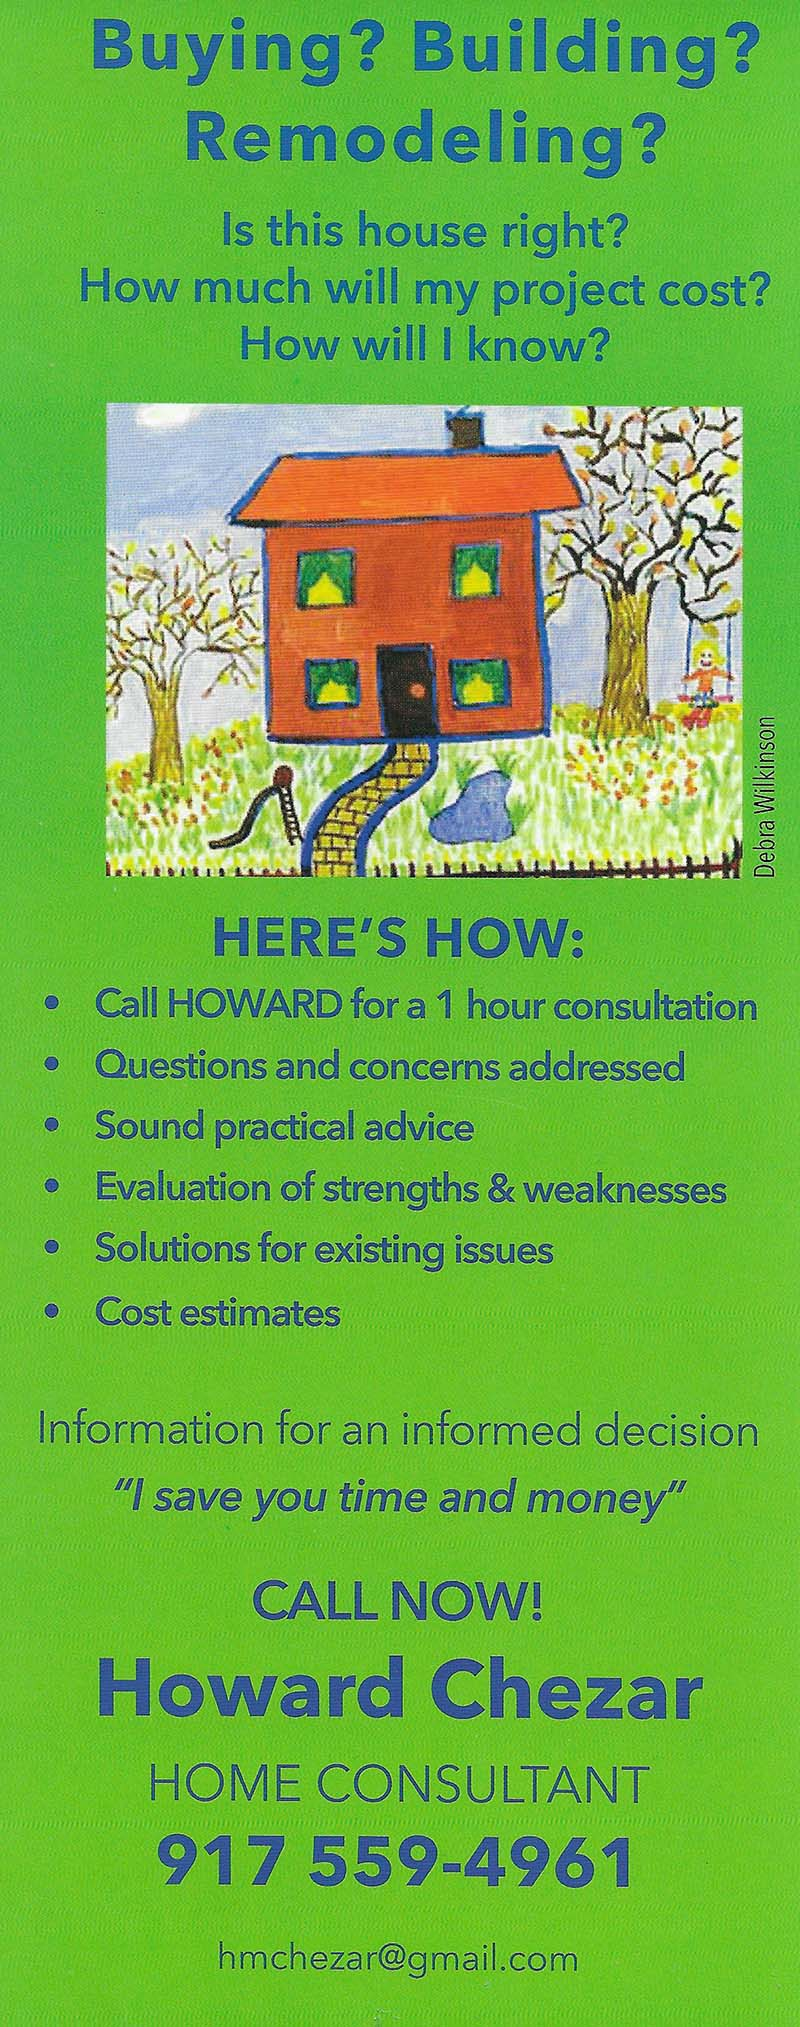 Howard Chezar brochure thumbnail